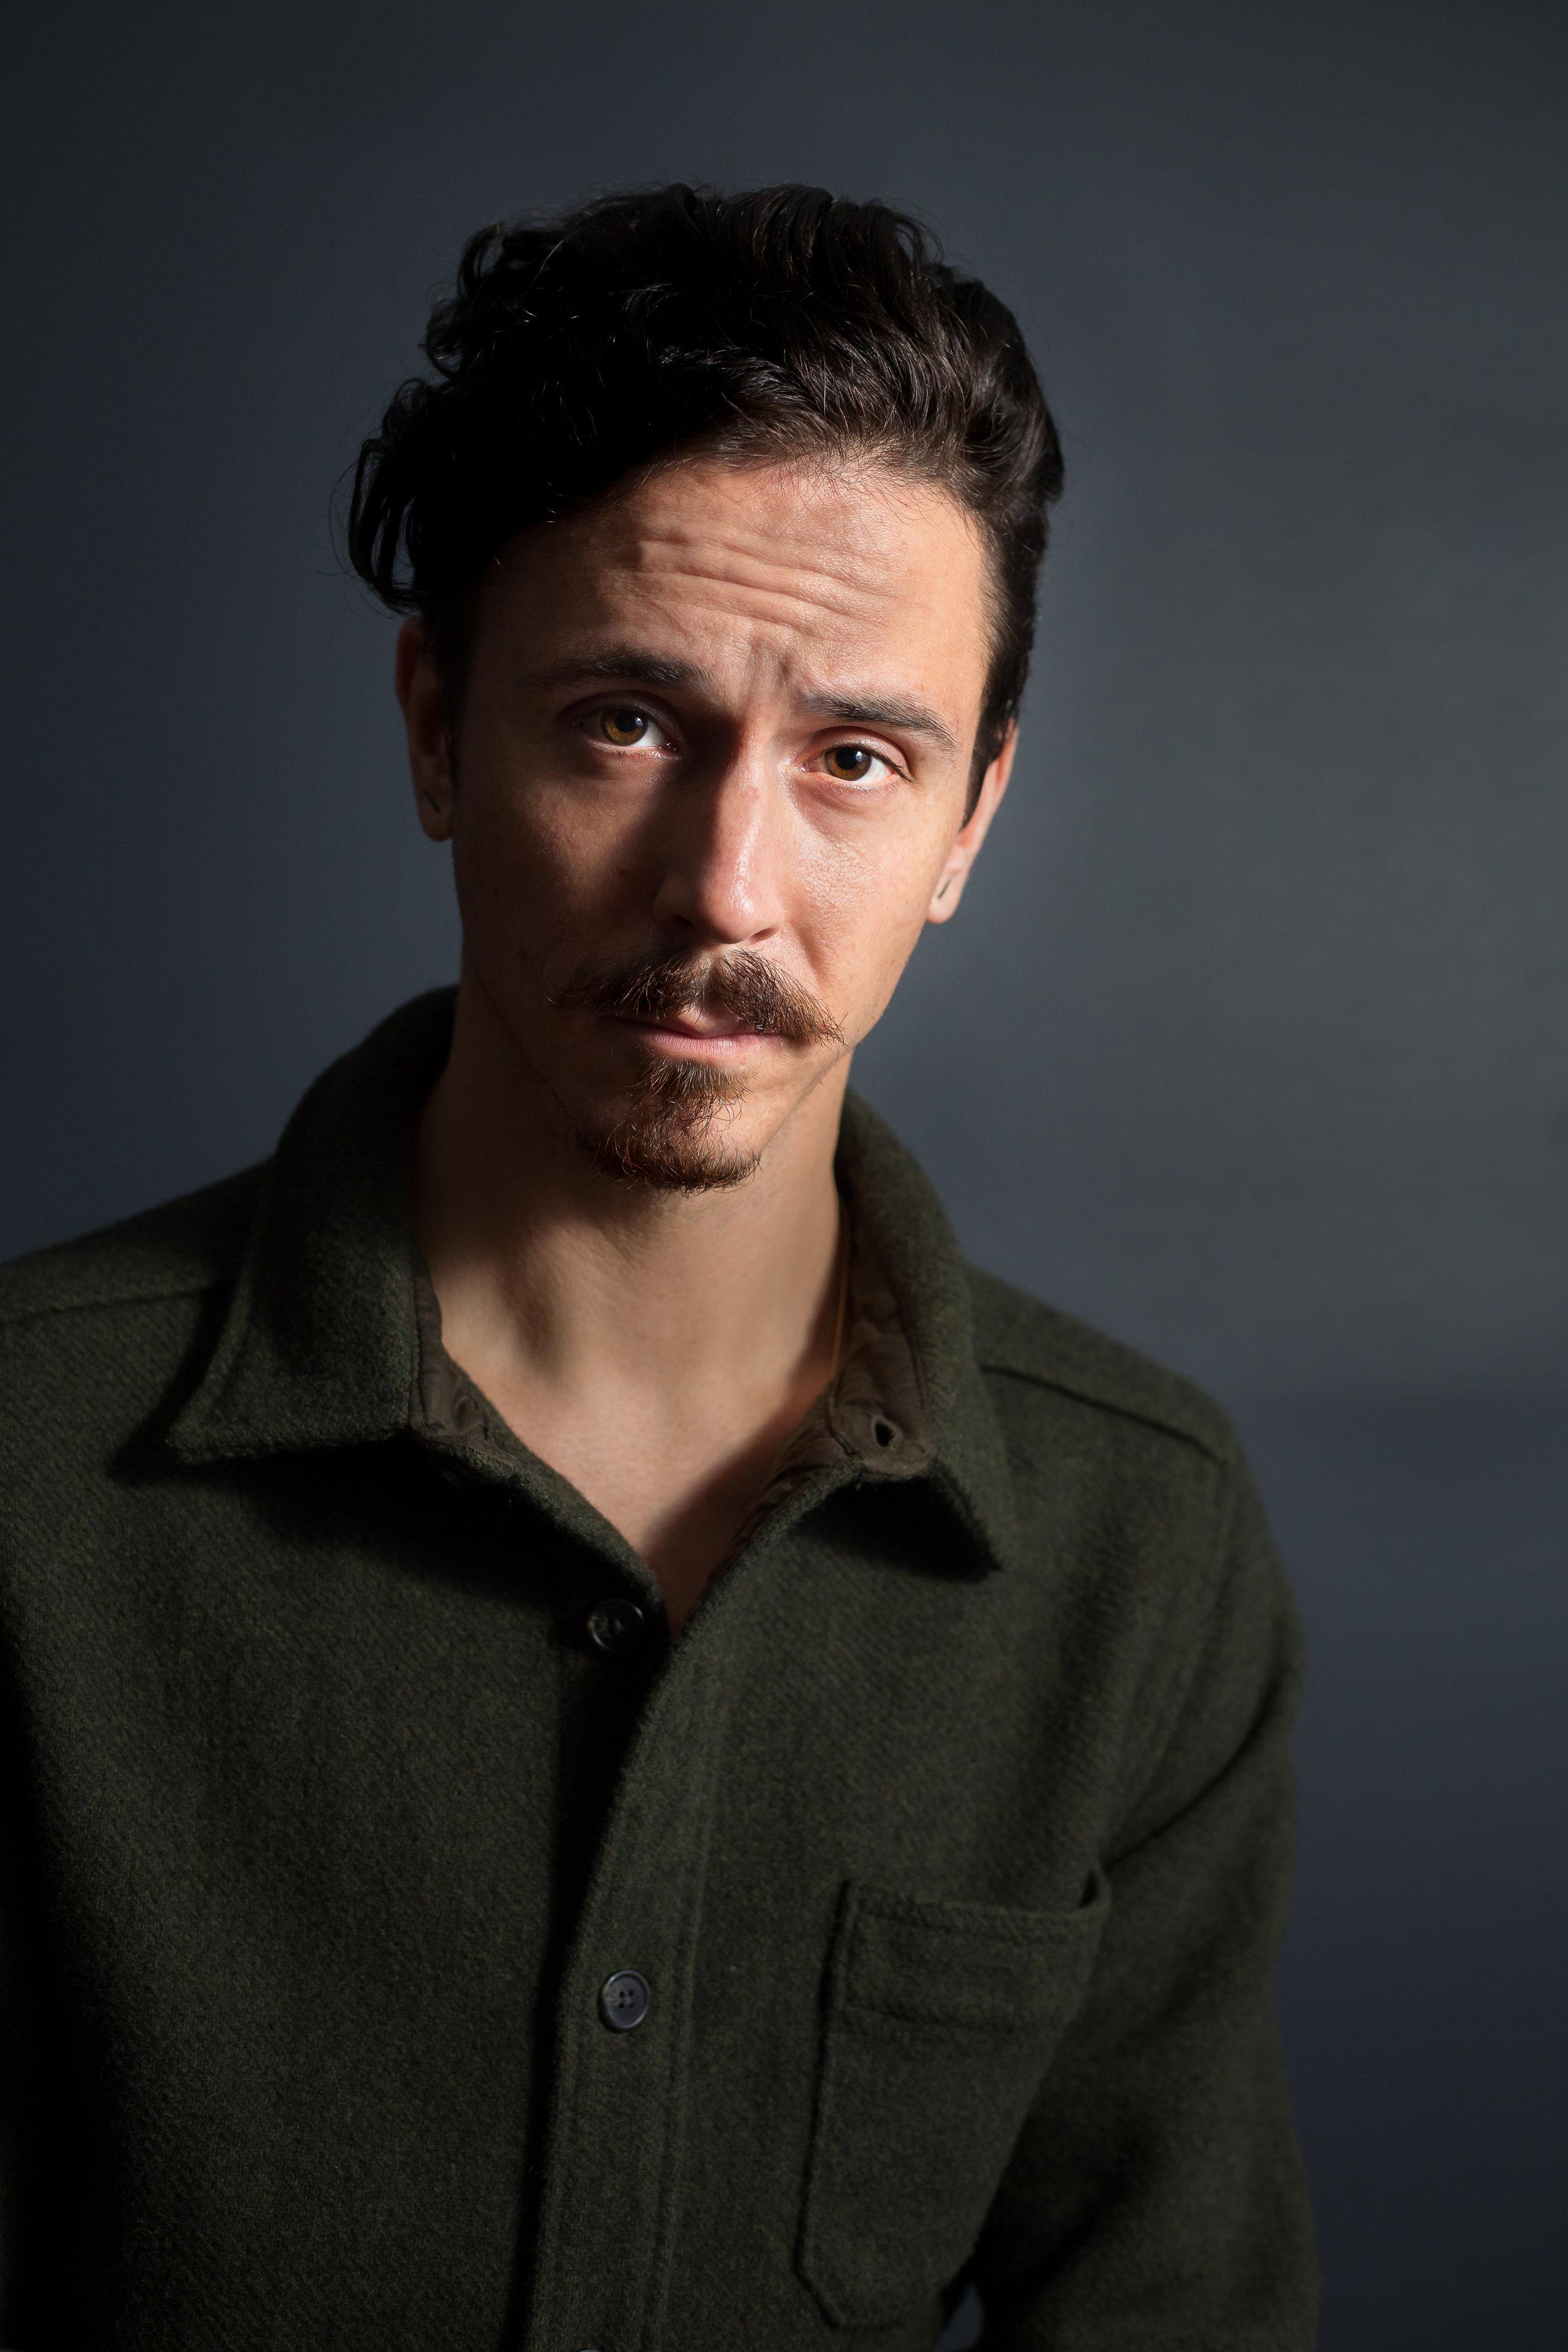 chicago_actor_headshots